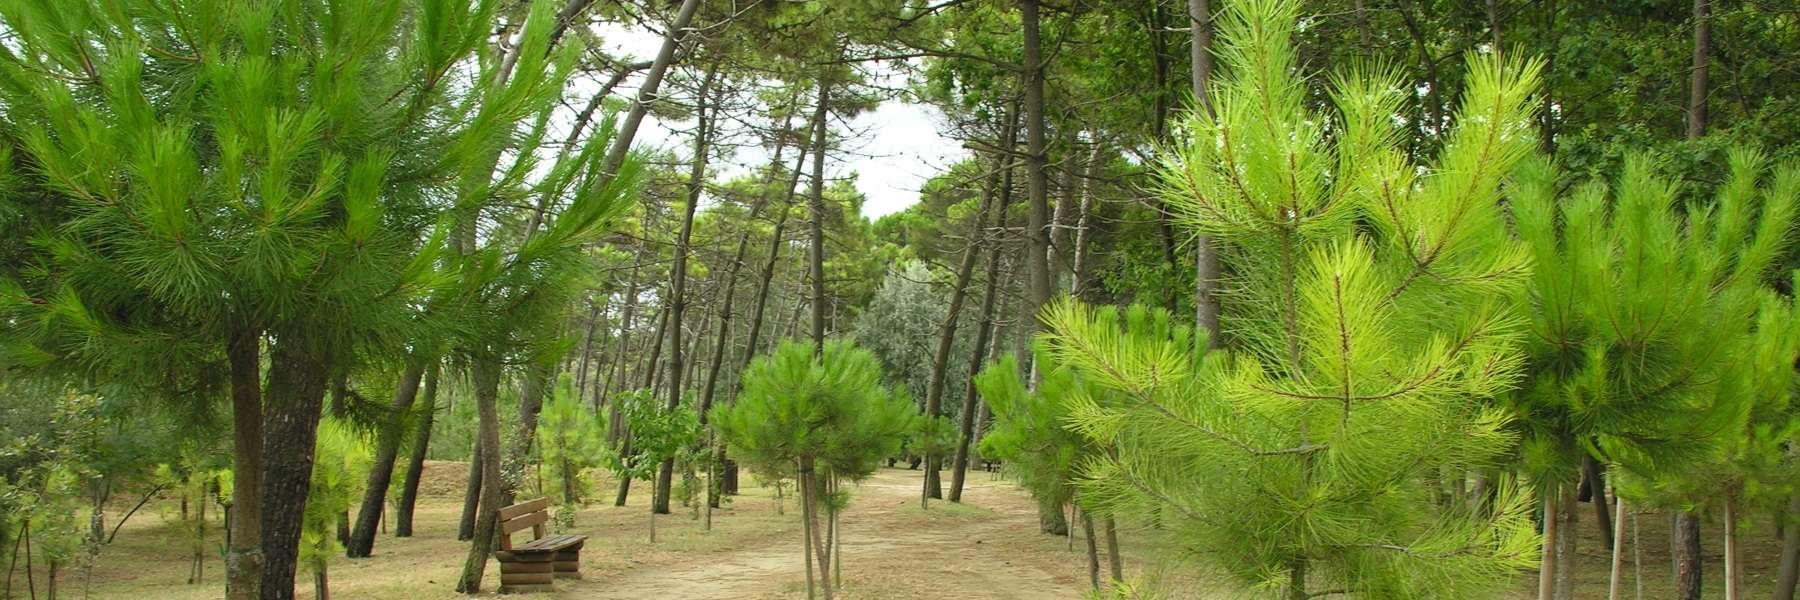 Pinienwaldregeln